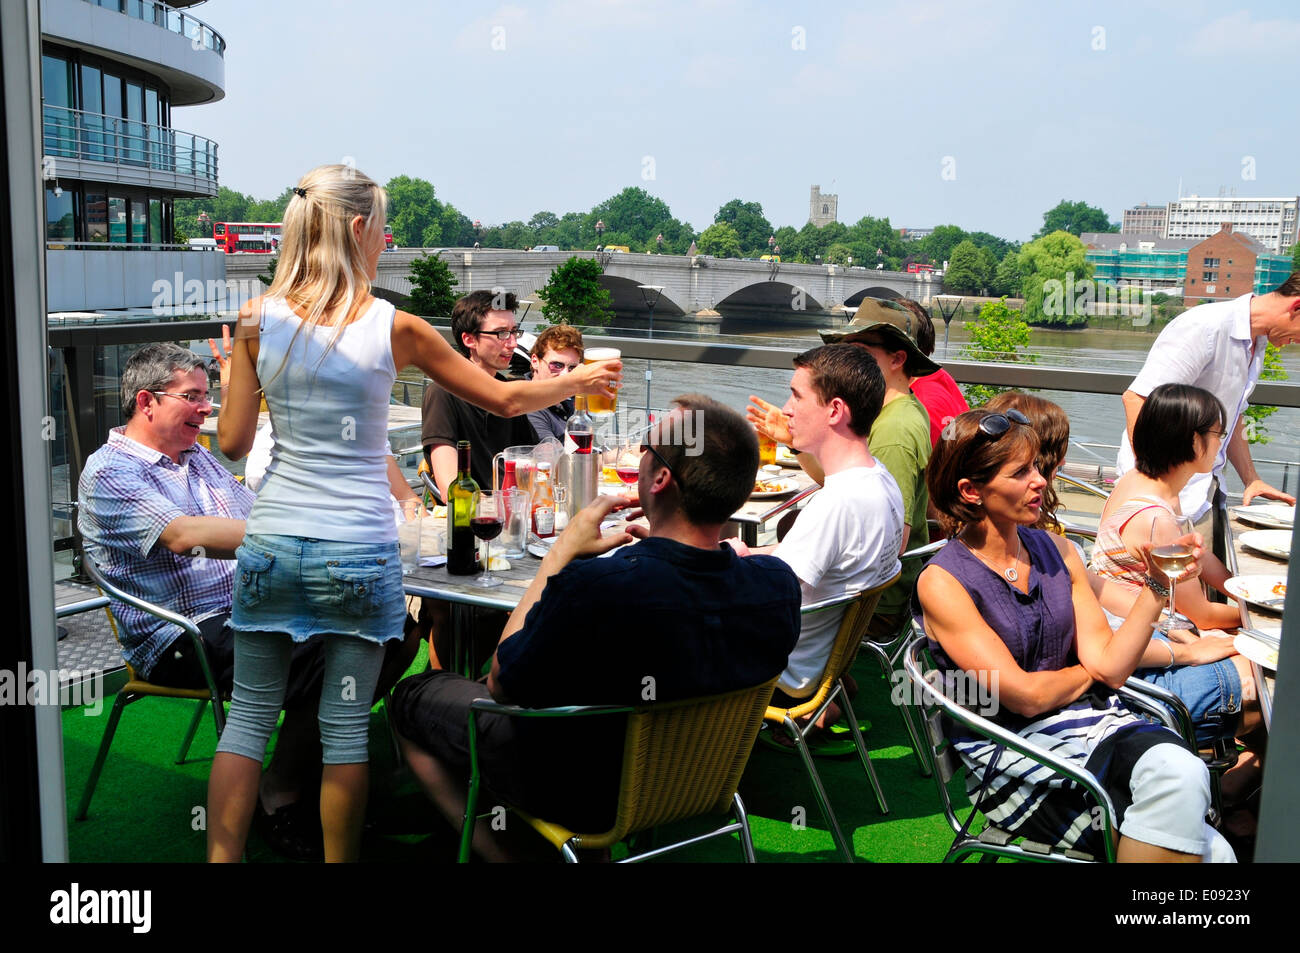 Trinker auf dem Balkon des The Boathouse Pub, Putney, London, England Stockbild